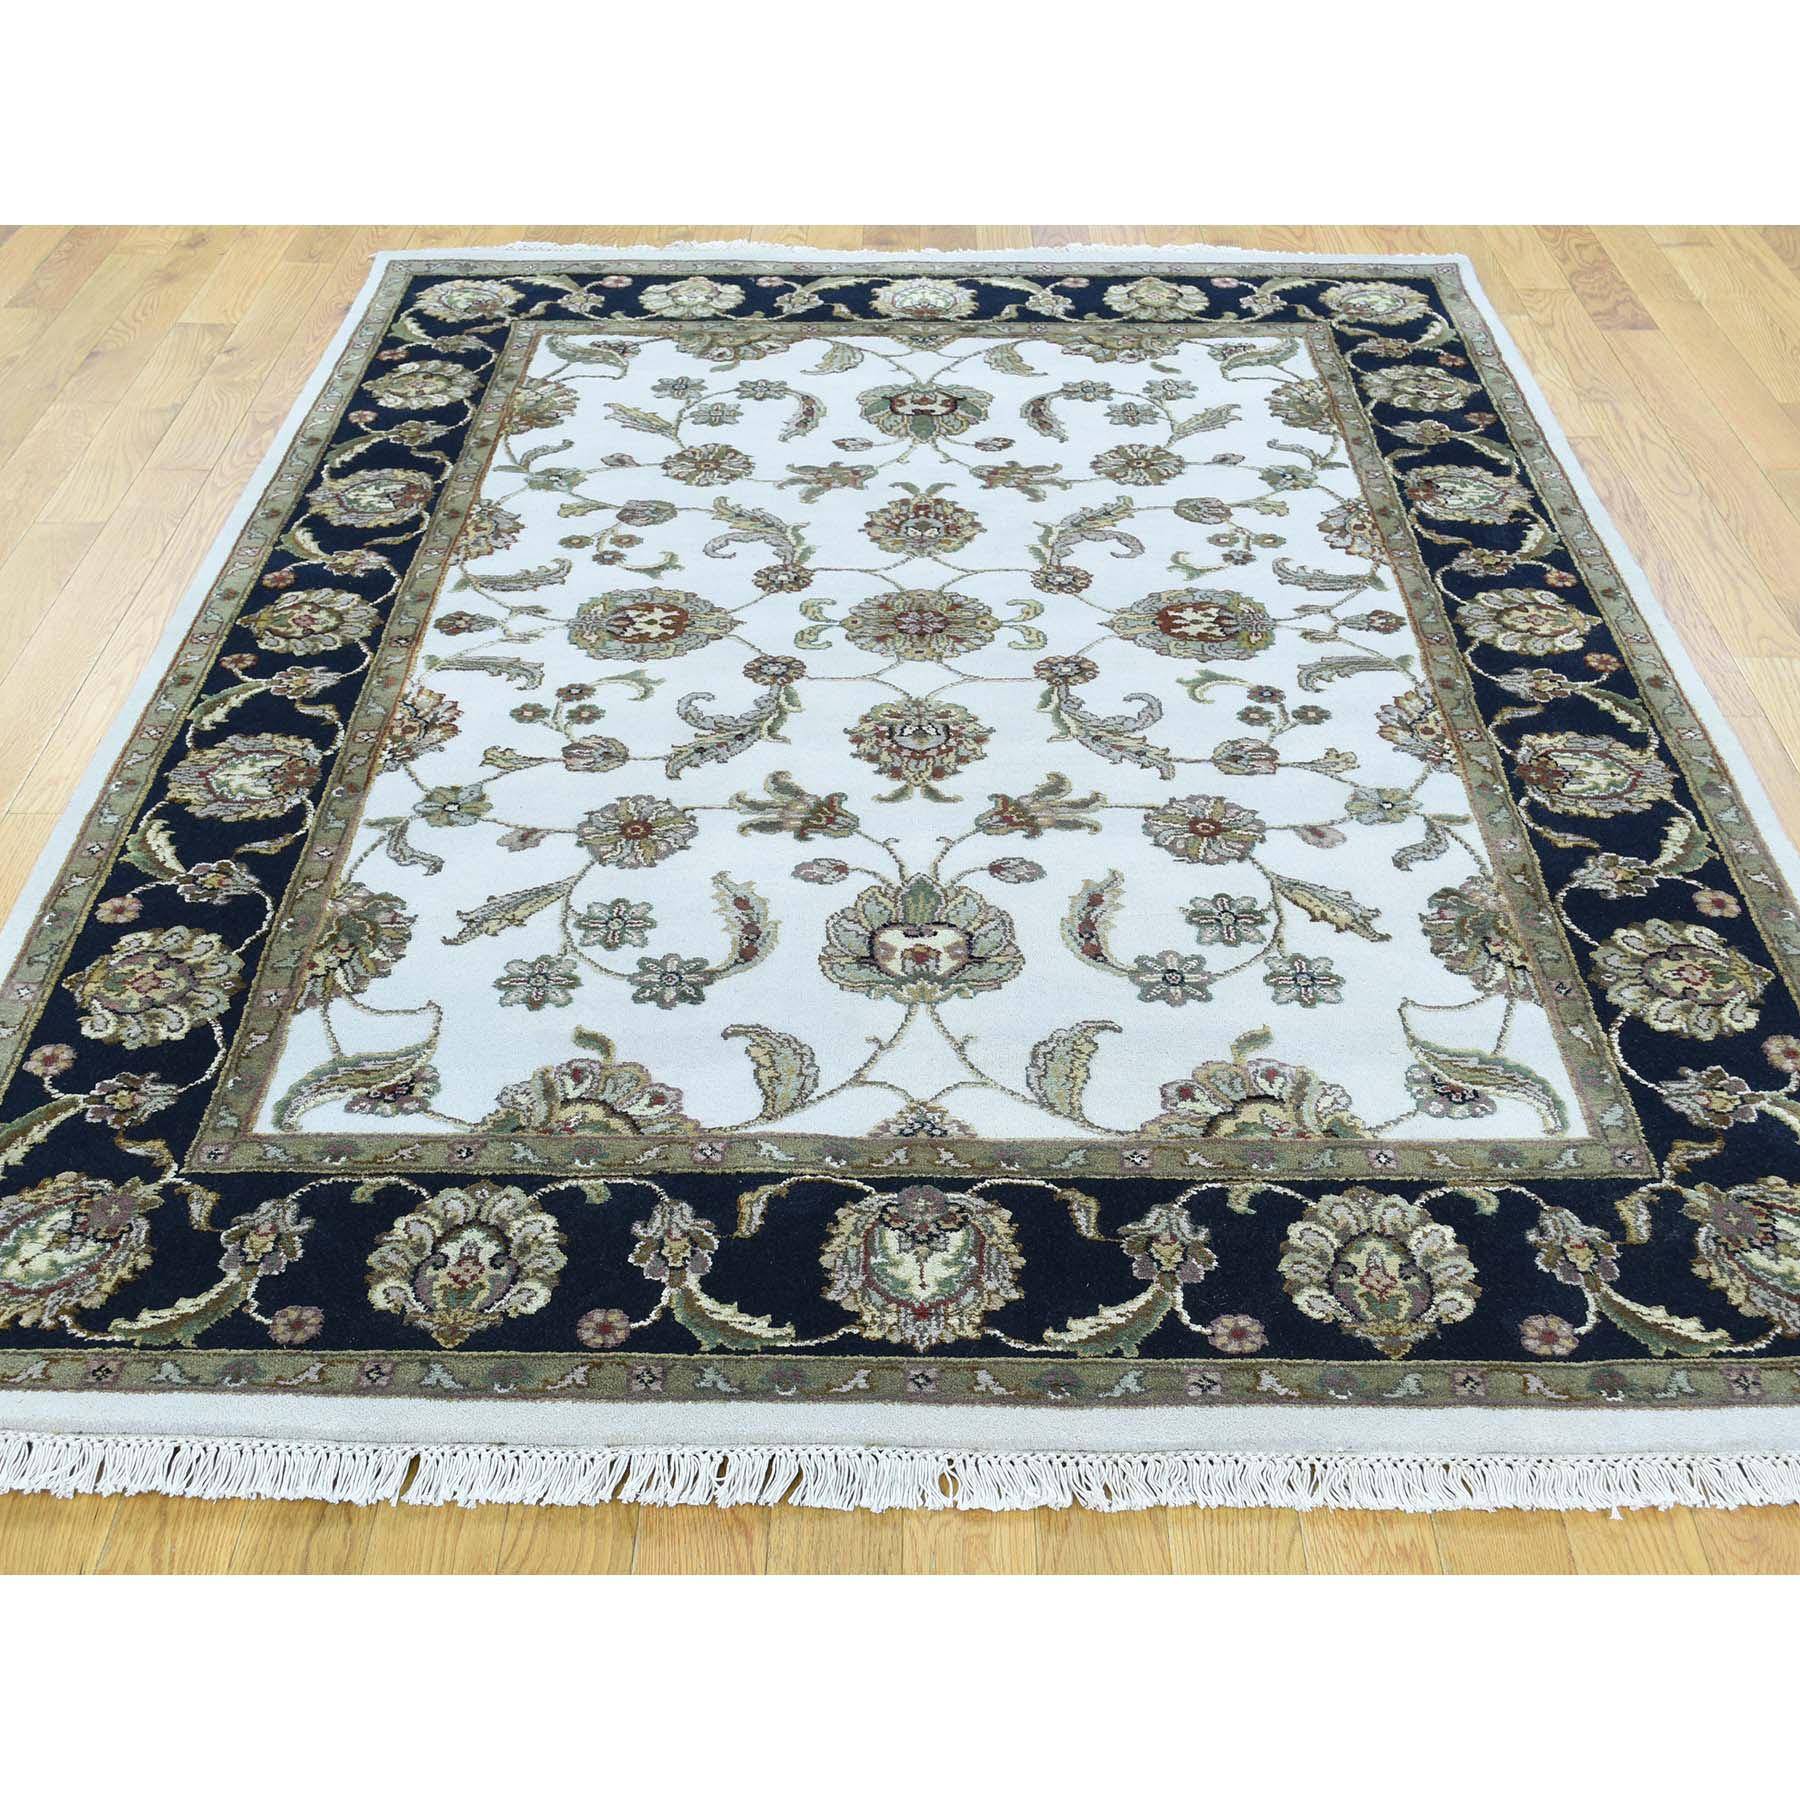 5-1 x7- Half Wool And Half Silk Hand-Knotted Rajasthan Oriental Carpet